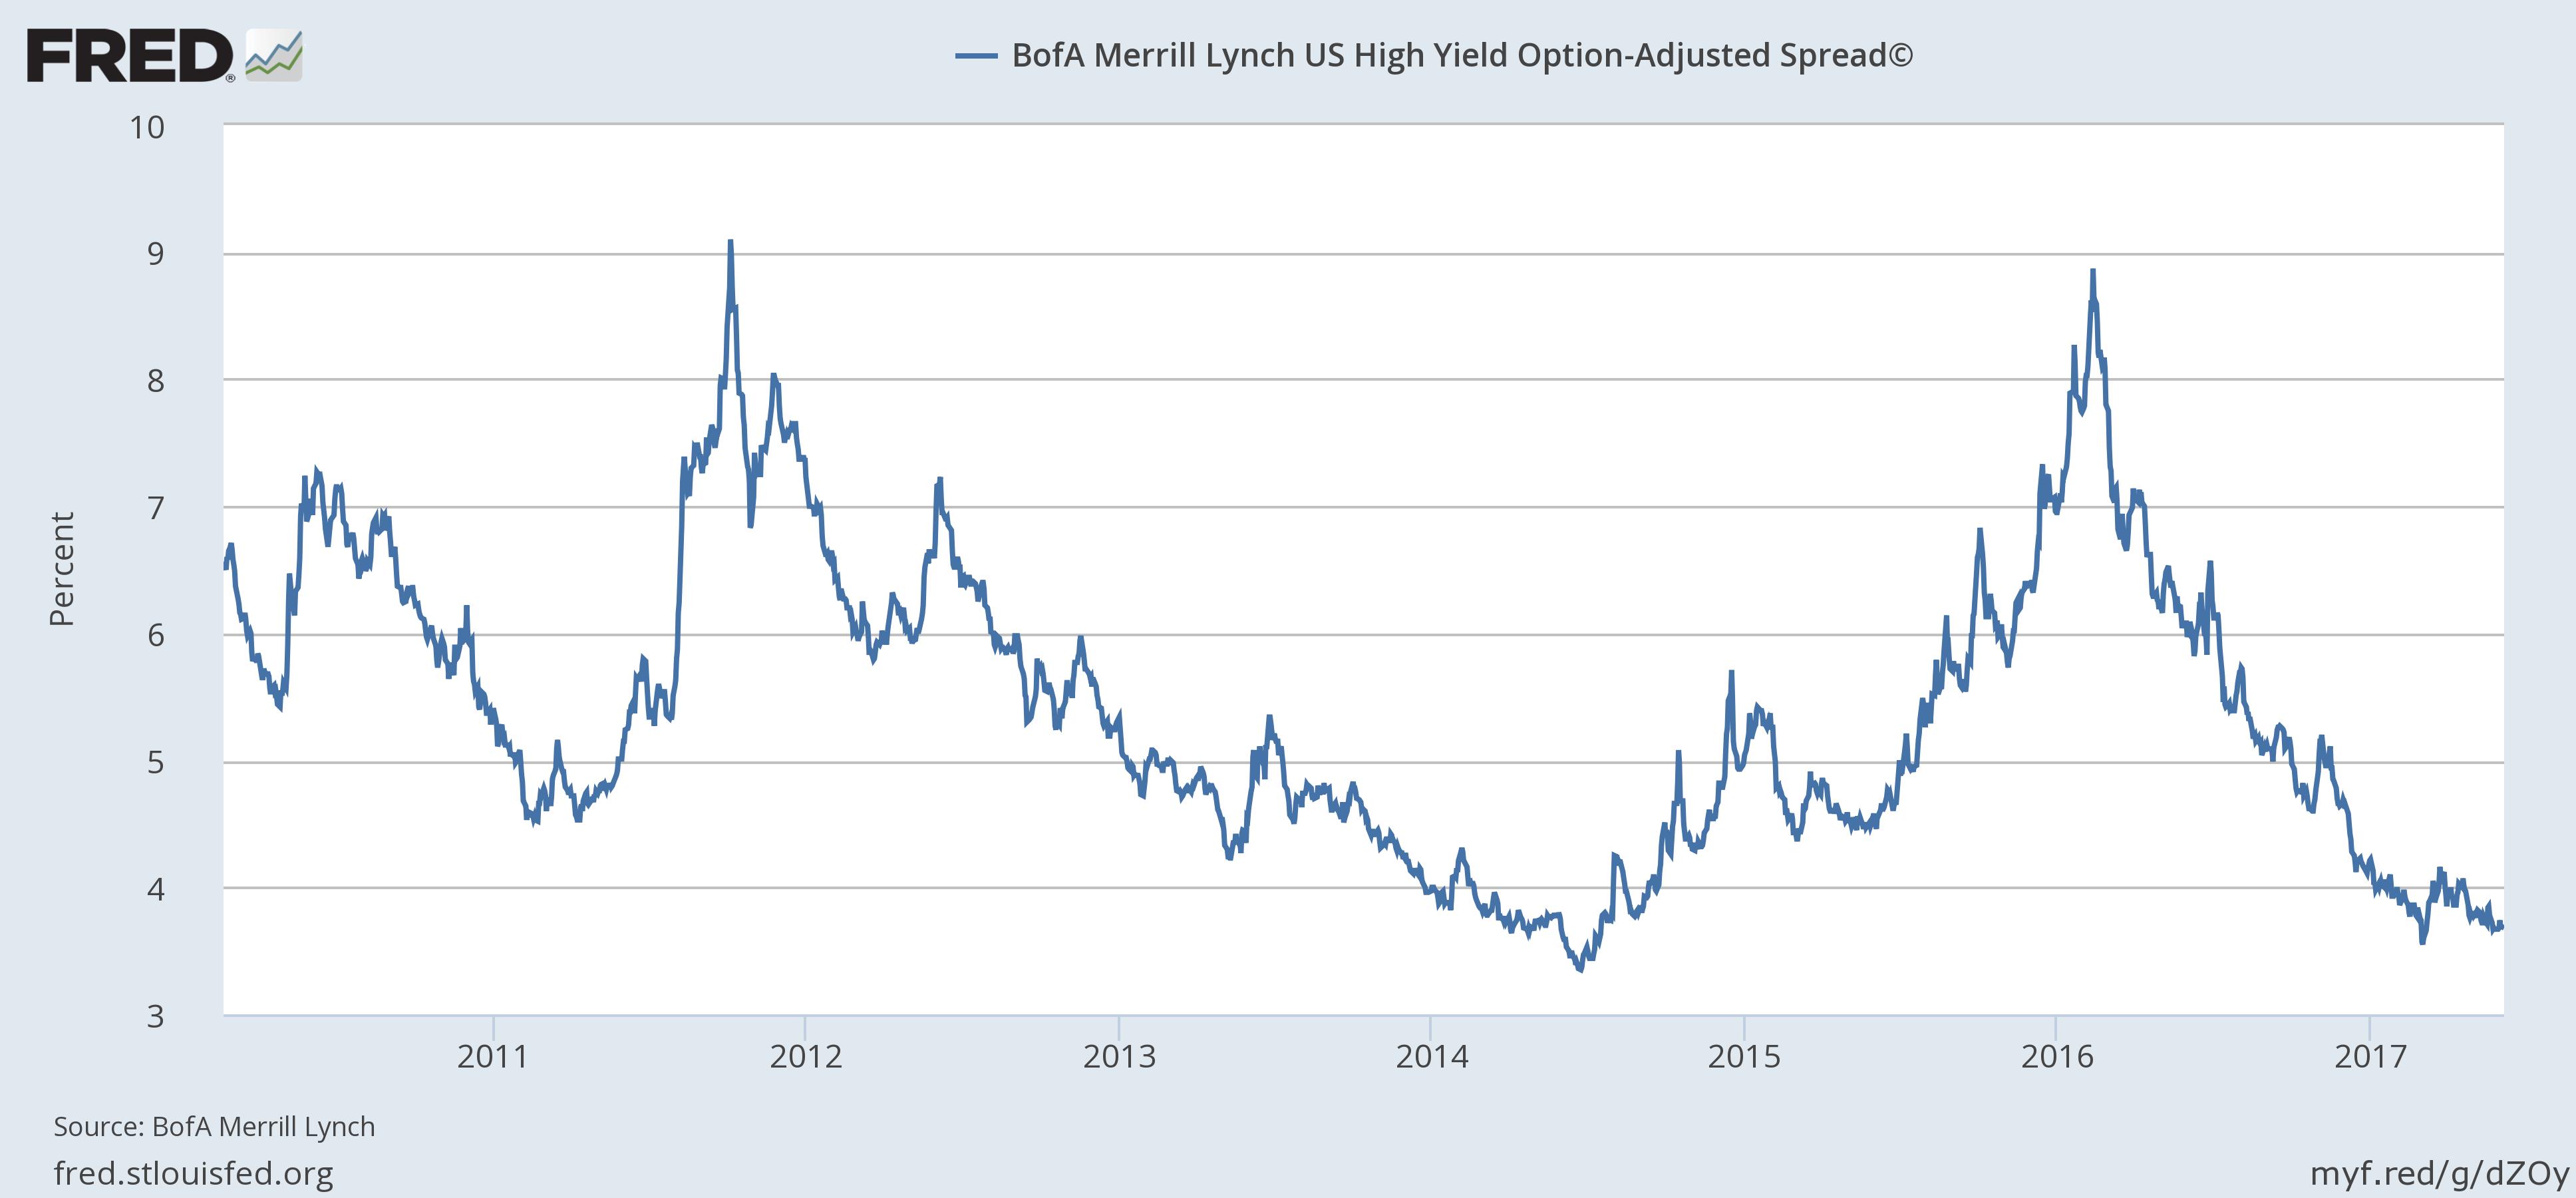 U.S. High Yield Option, 2011 - 2017